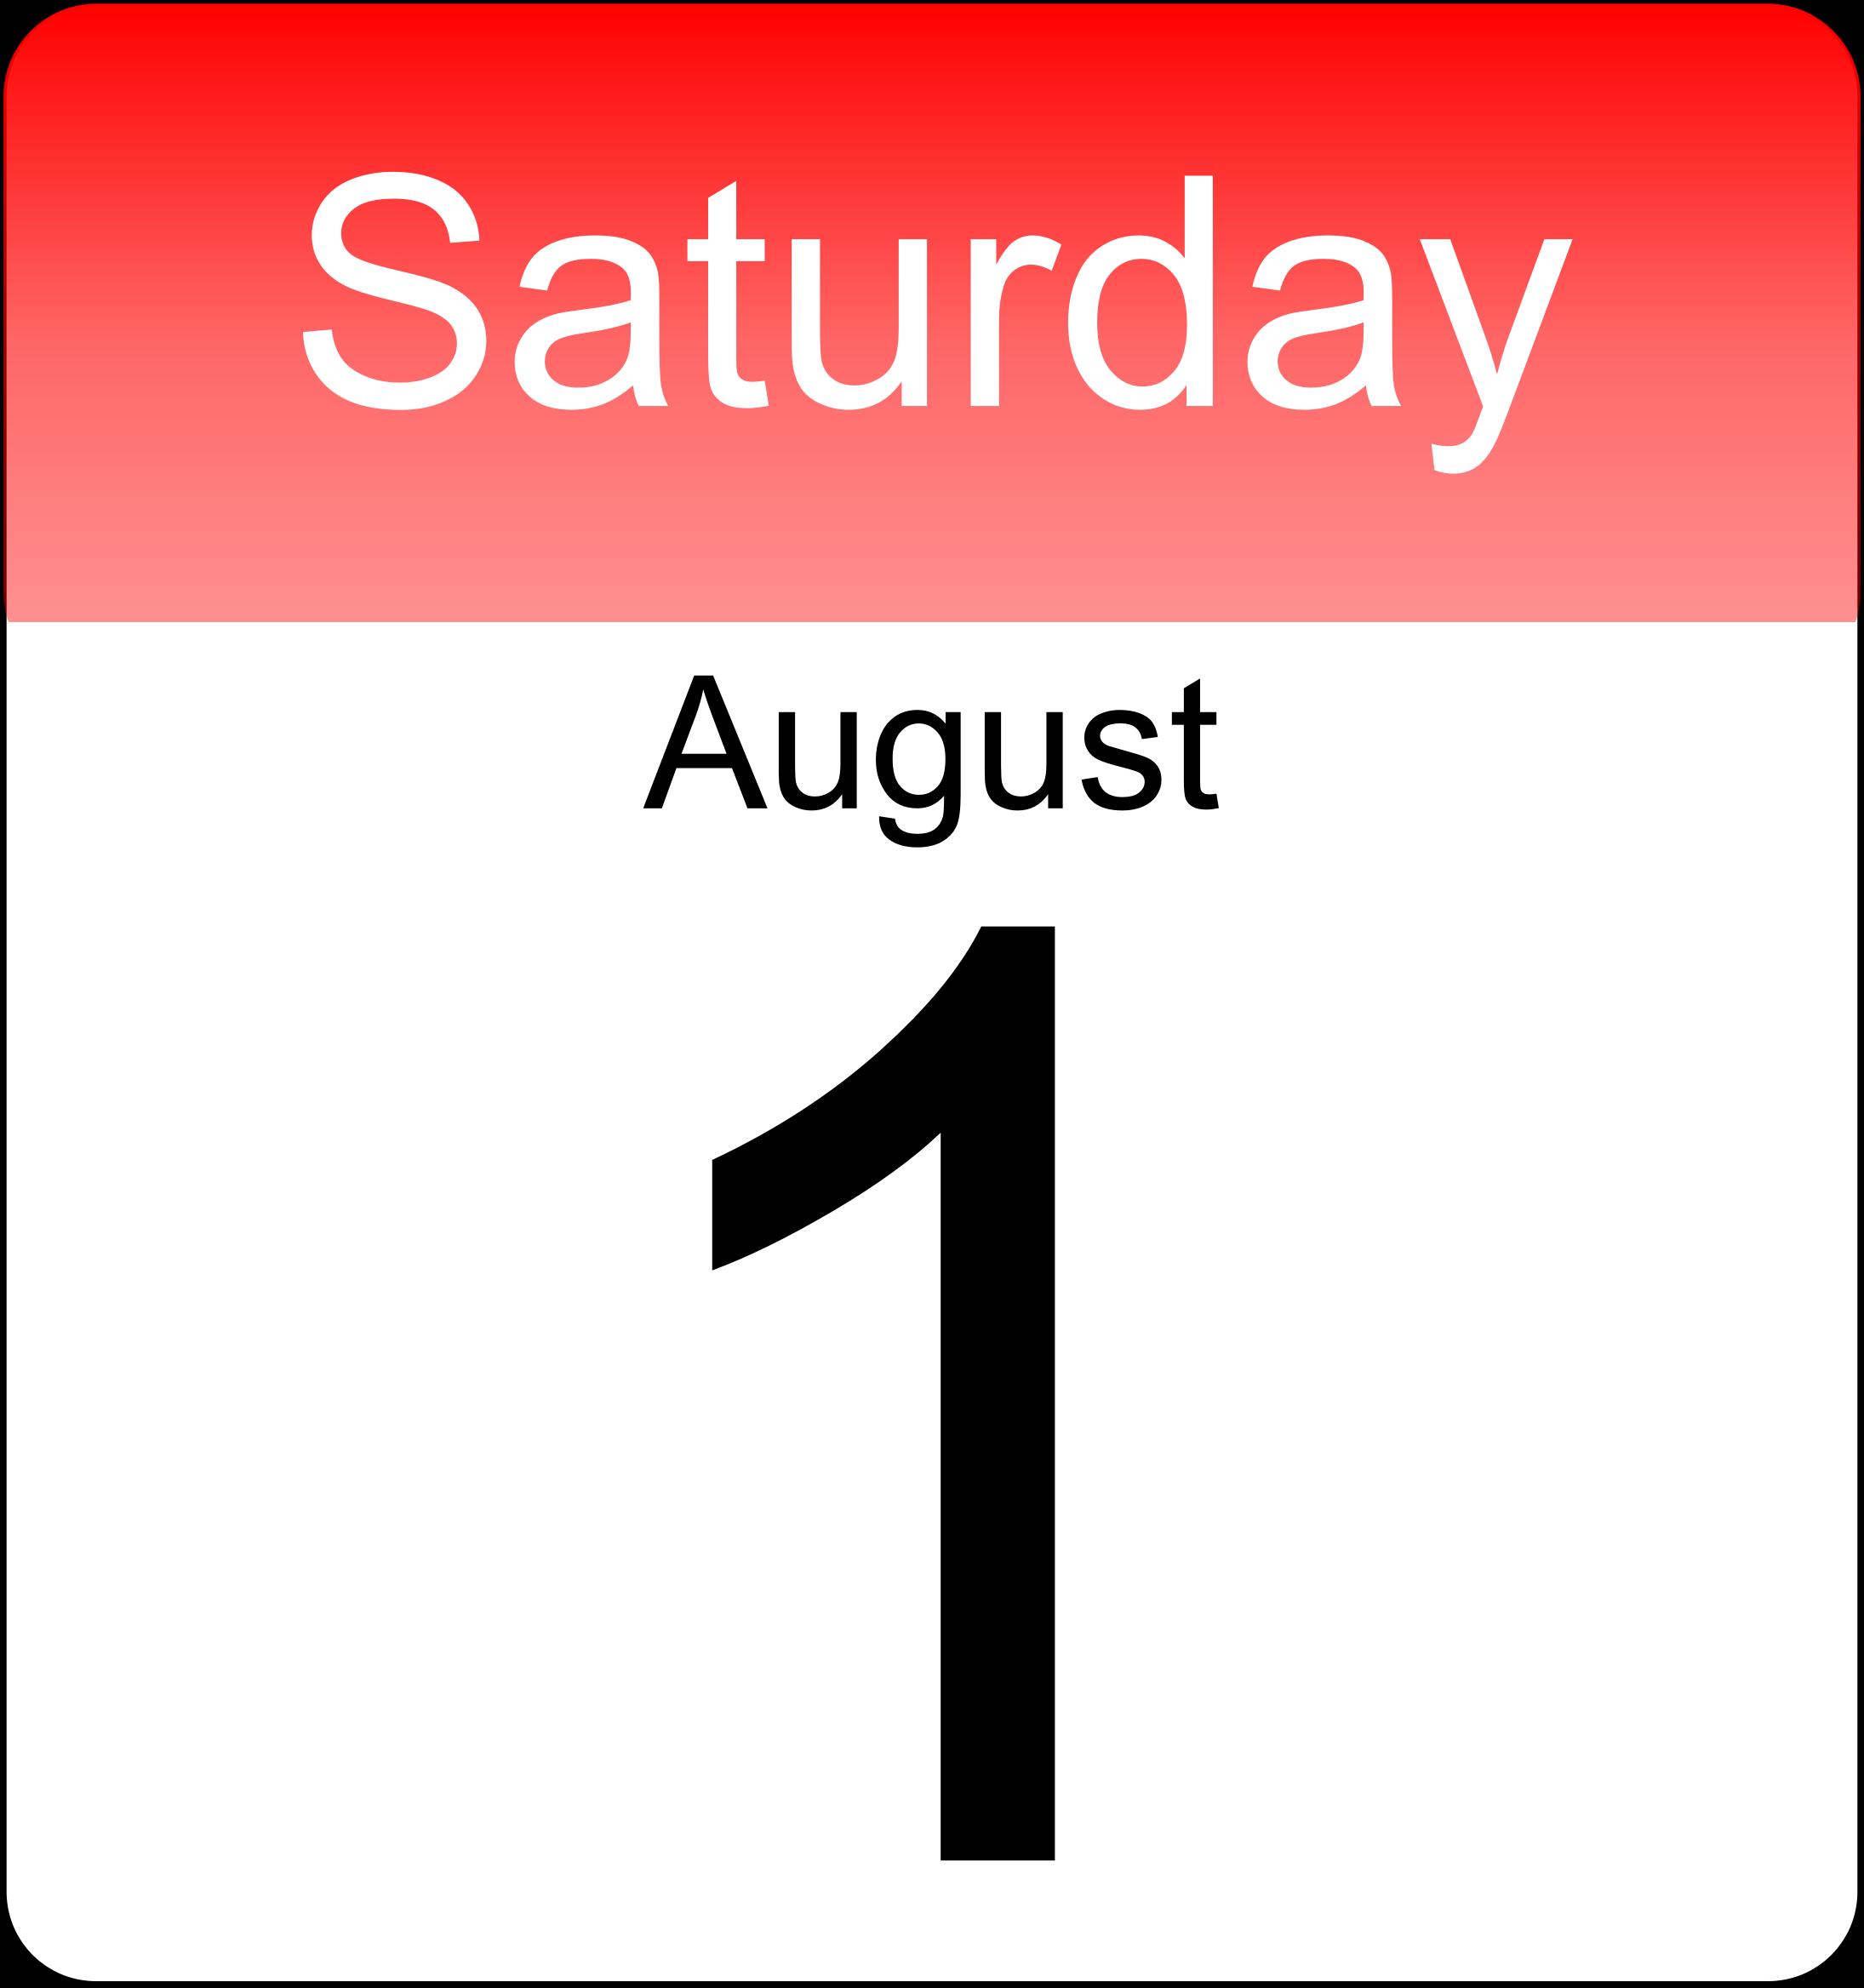 Big image png. Calendar clipart day